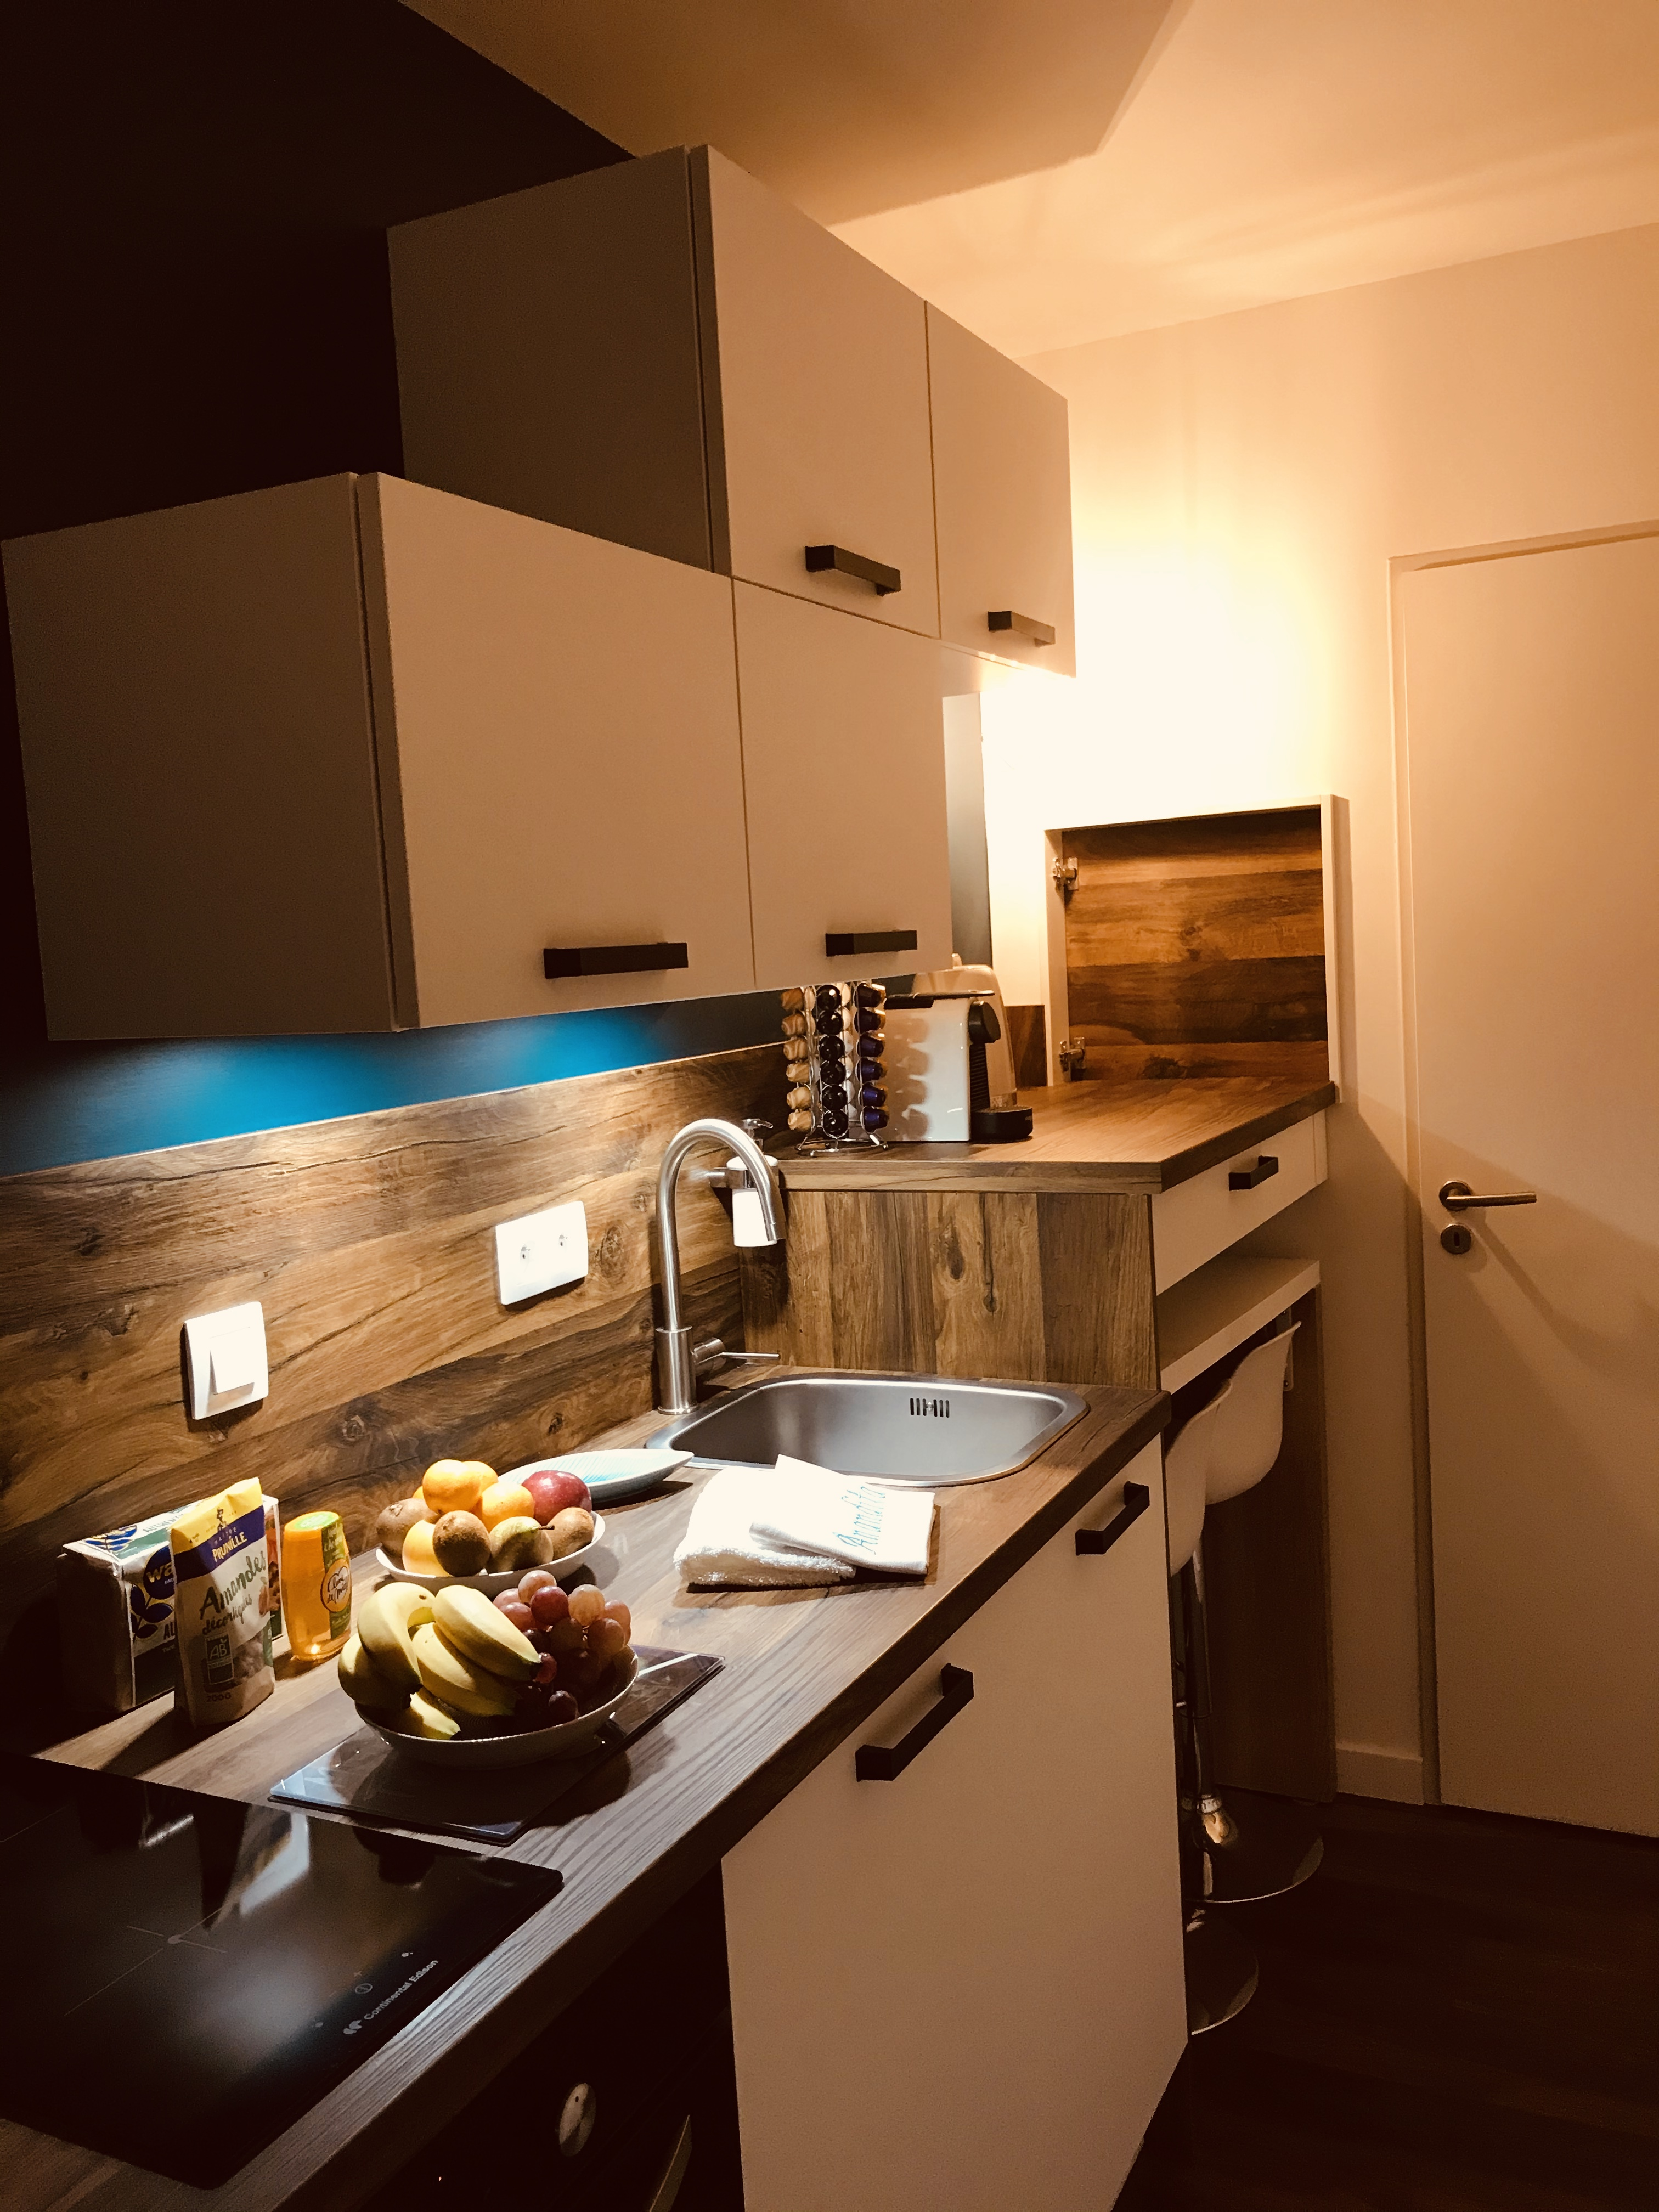 Anandita kitchenette de nuit